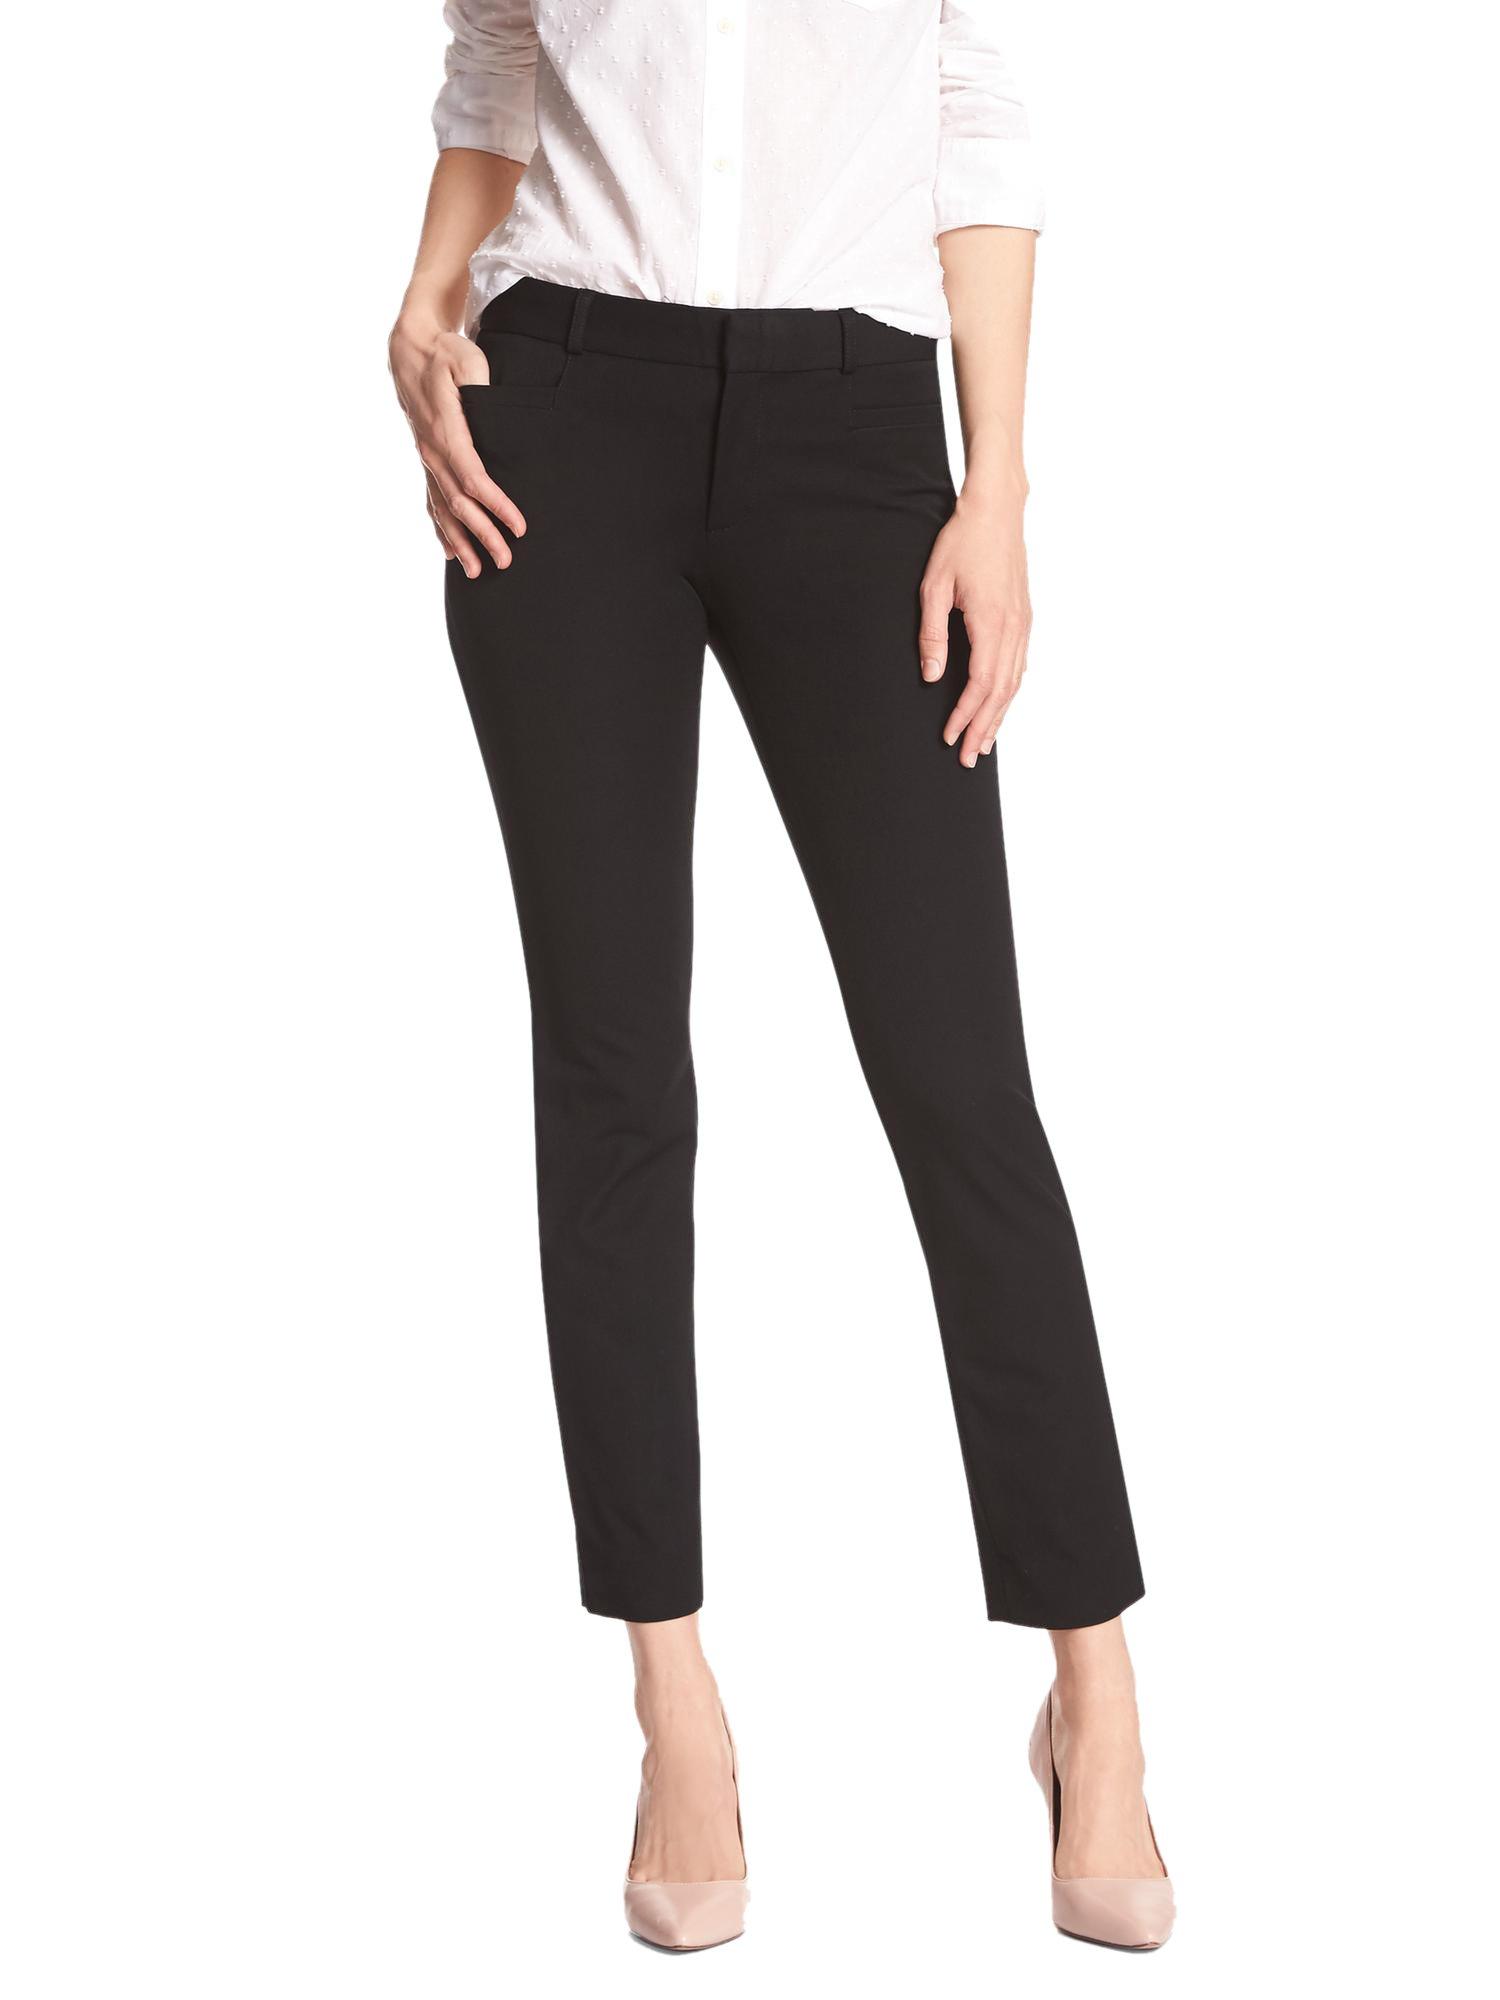 Banana Republic Women's Sloan Fit Twill Slim Ankle Cropped Pants Black 10